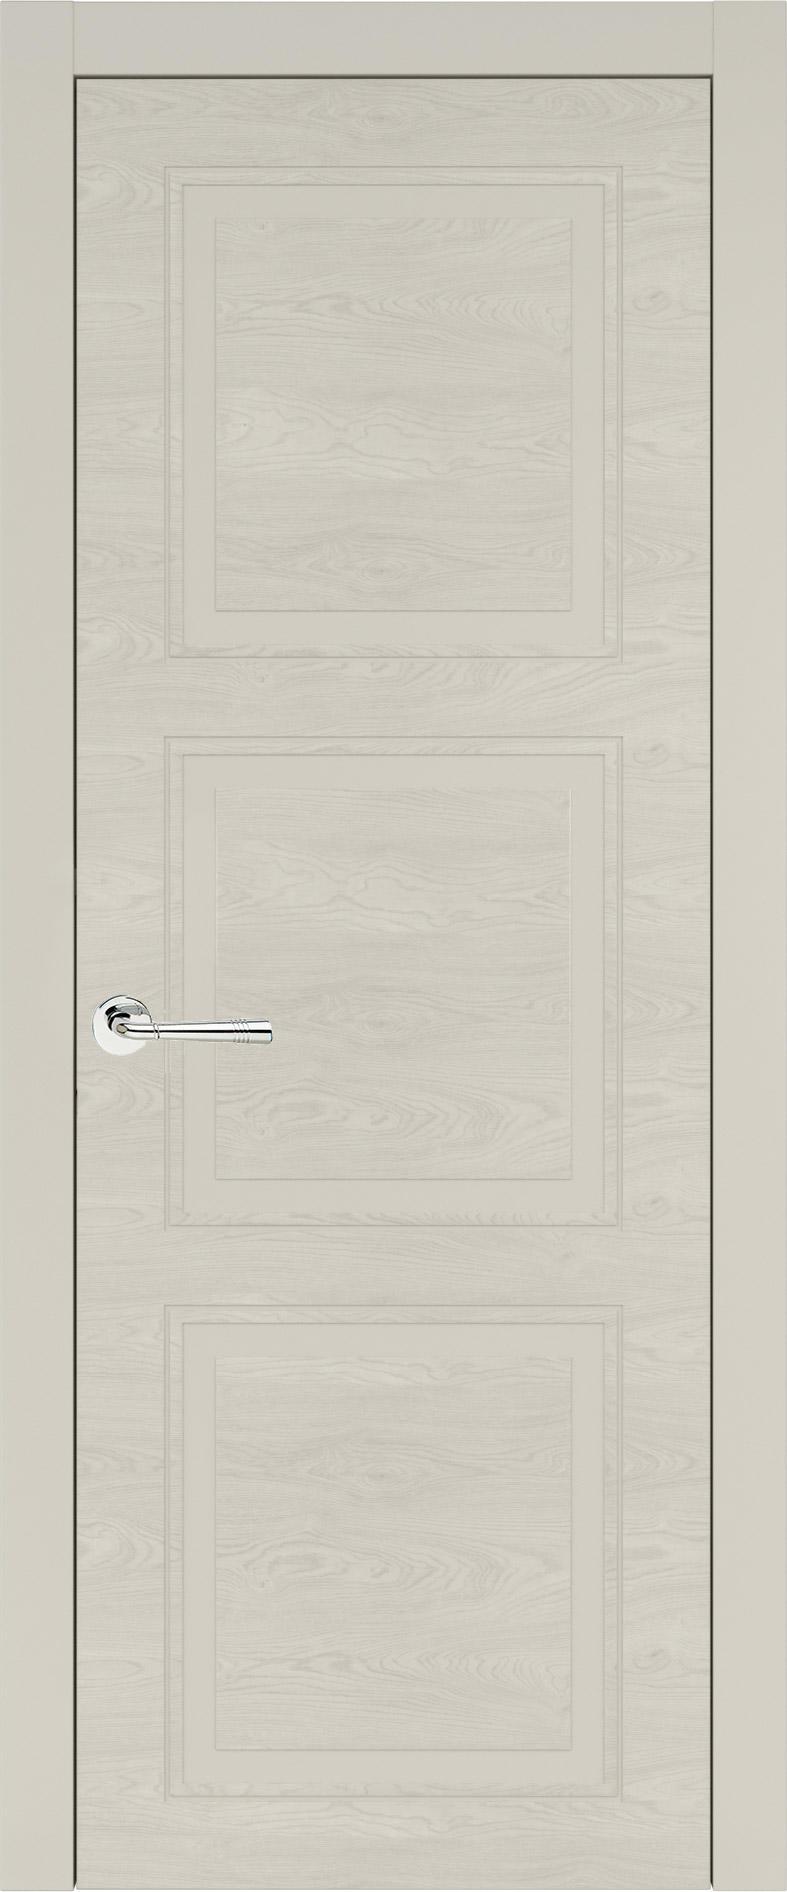 Milano Neo Classic цвет - Жемчужная эмаль по шпону (RAL 1013) Без стекла (ДГ)